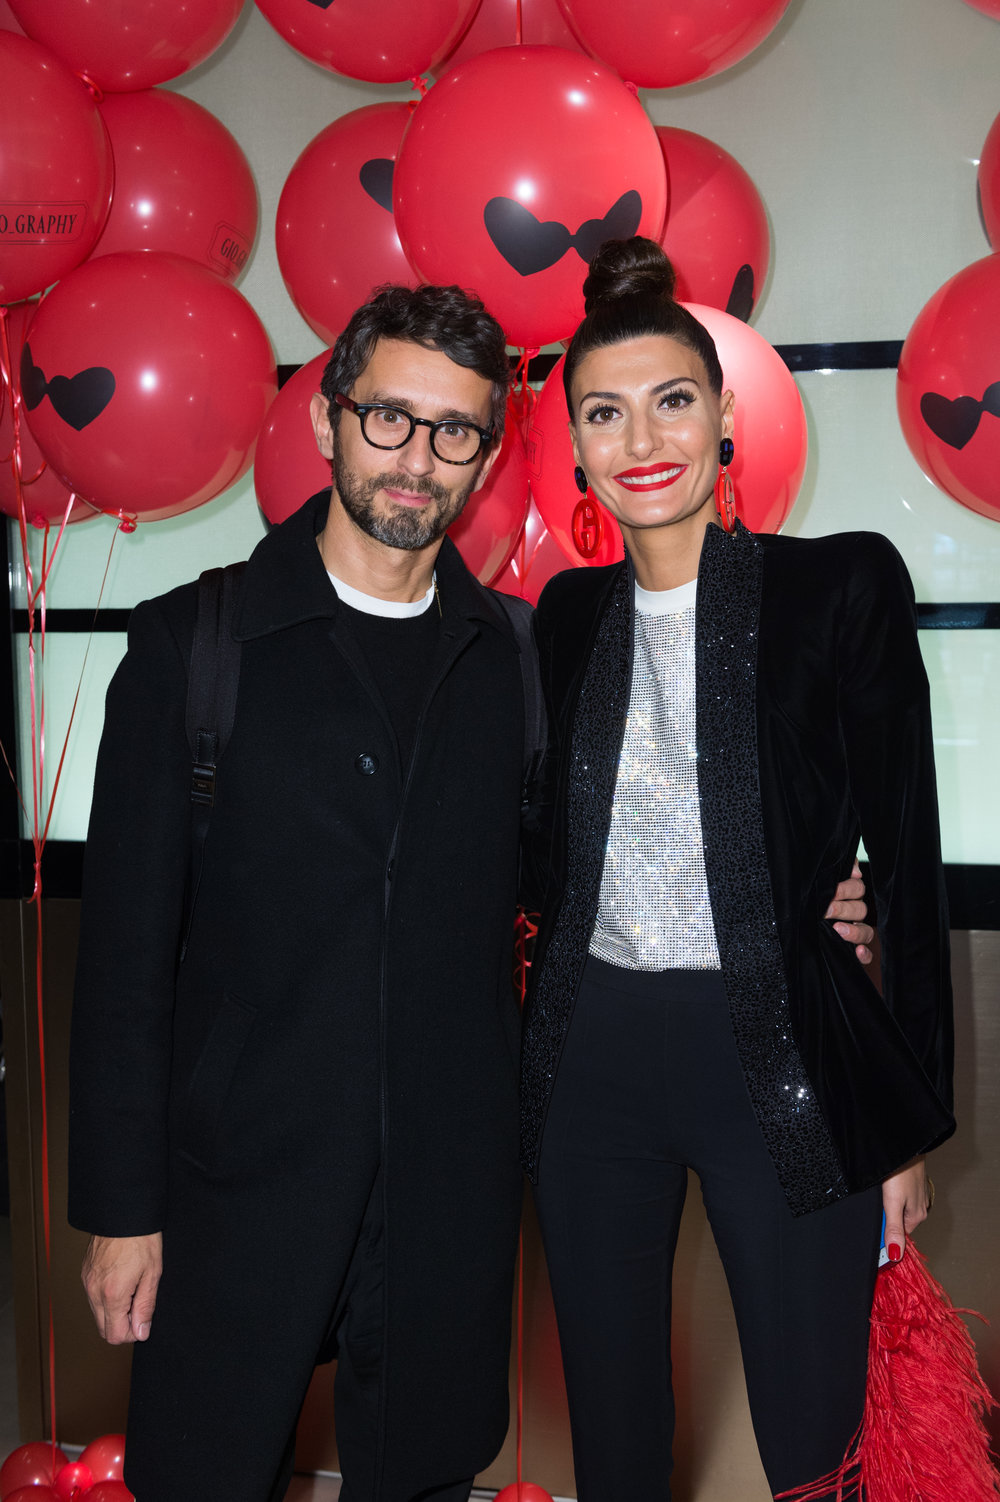 Simone Marchetti & Giovanna Engelbert